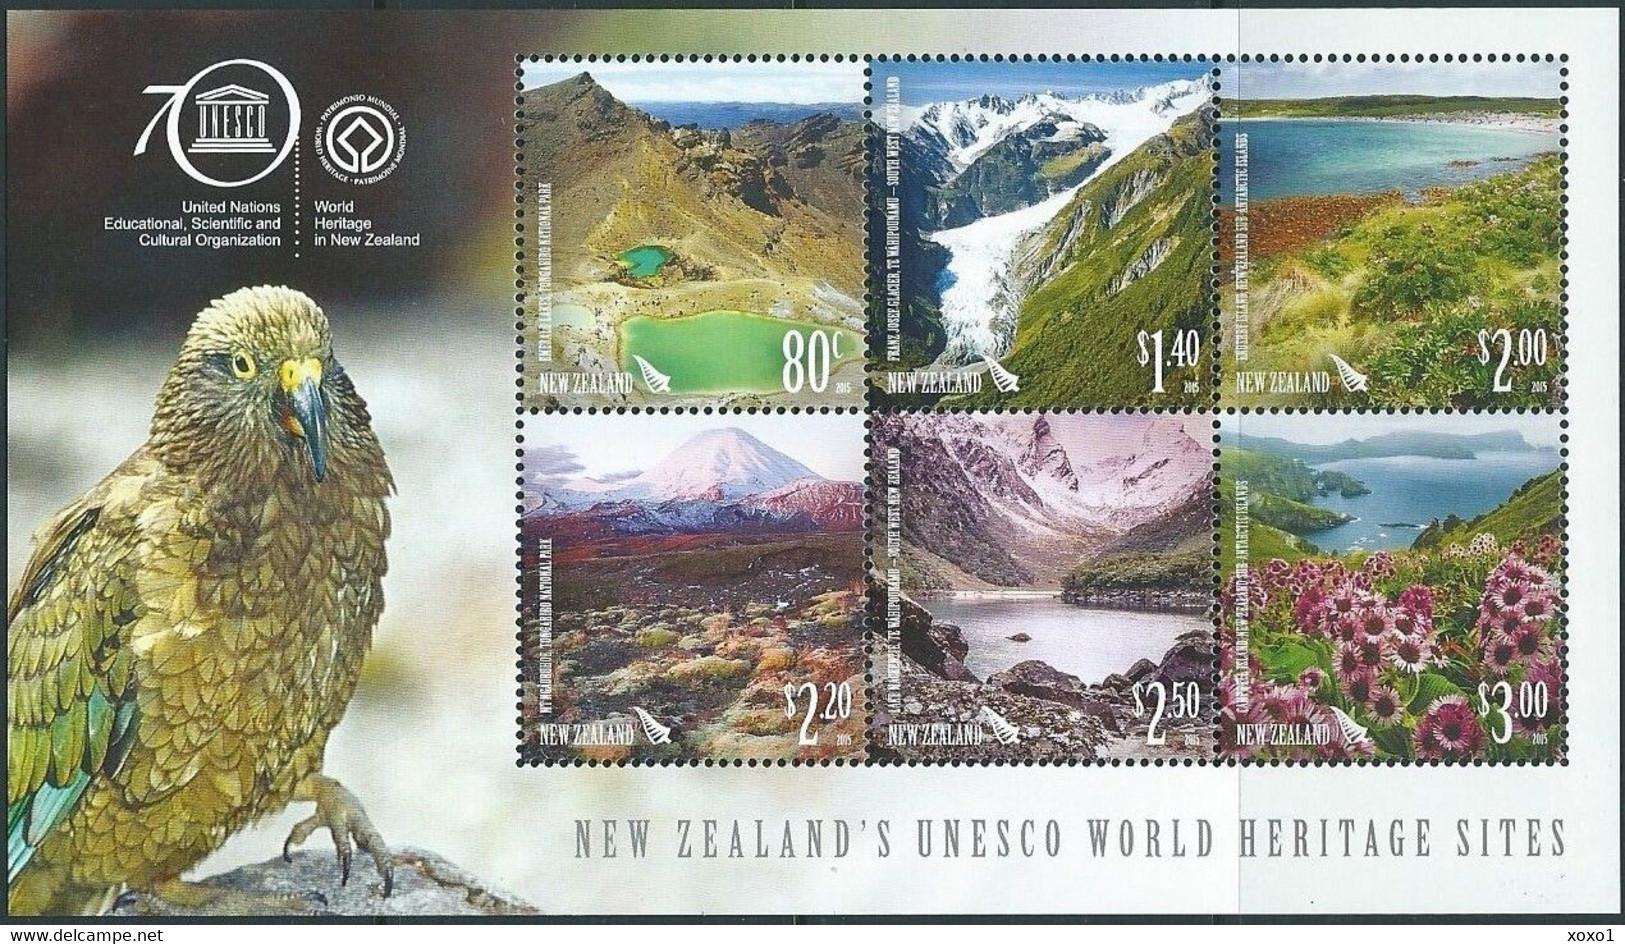 New Zealand 2015 MiNr. Block 360 Neuseeland BIRDS Parrots UNESCO HERITAGE SITES S\sh MNH** 15,00 € - Ungebraucht